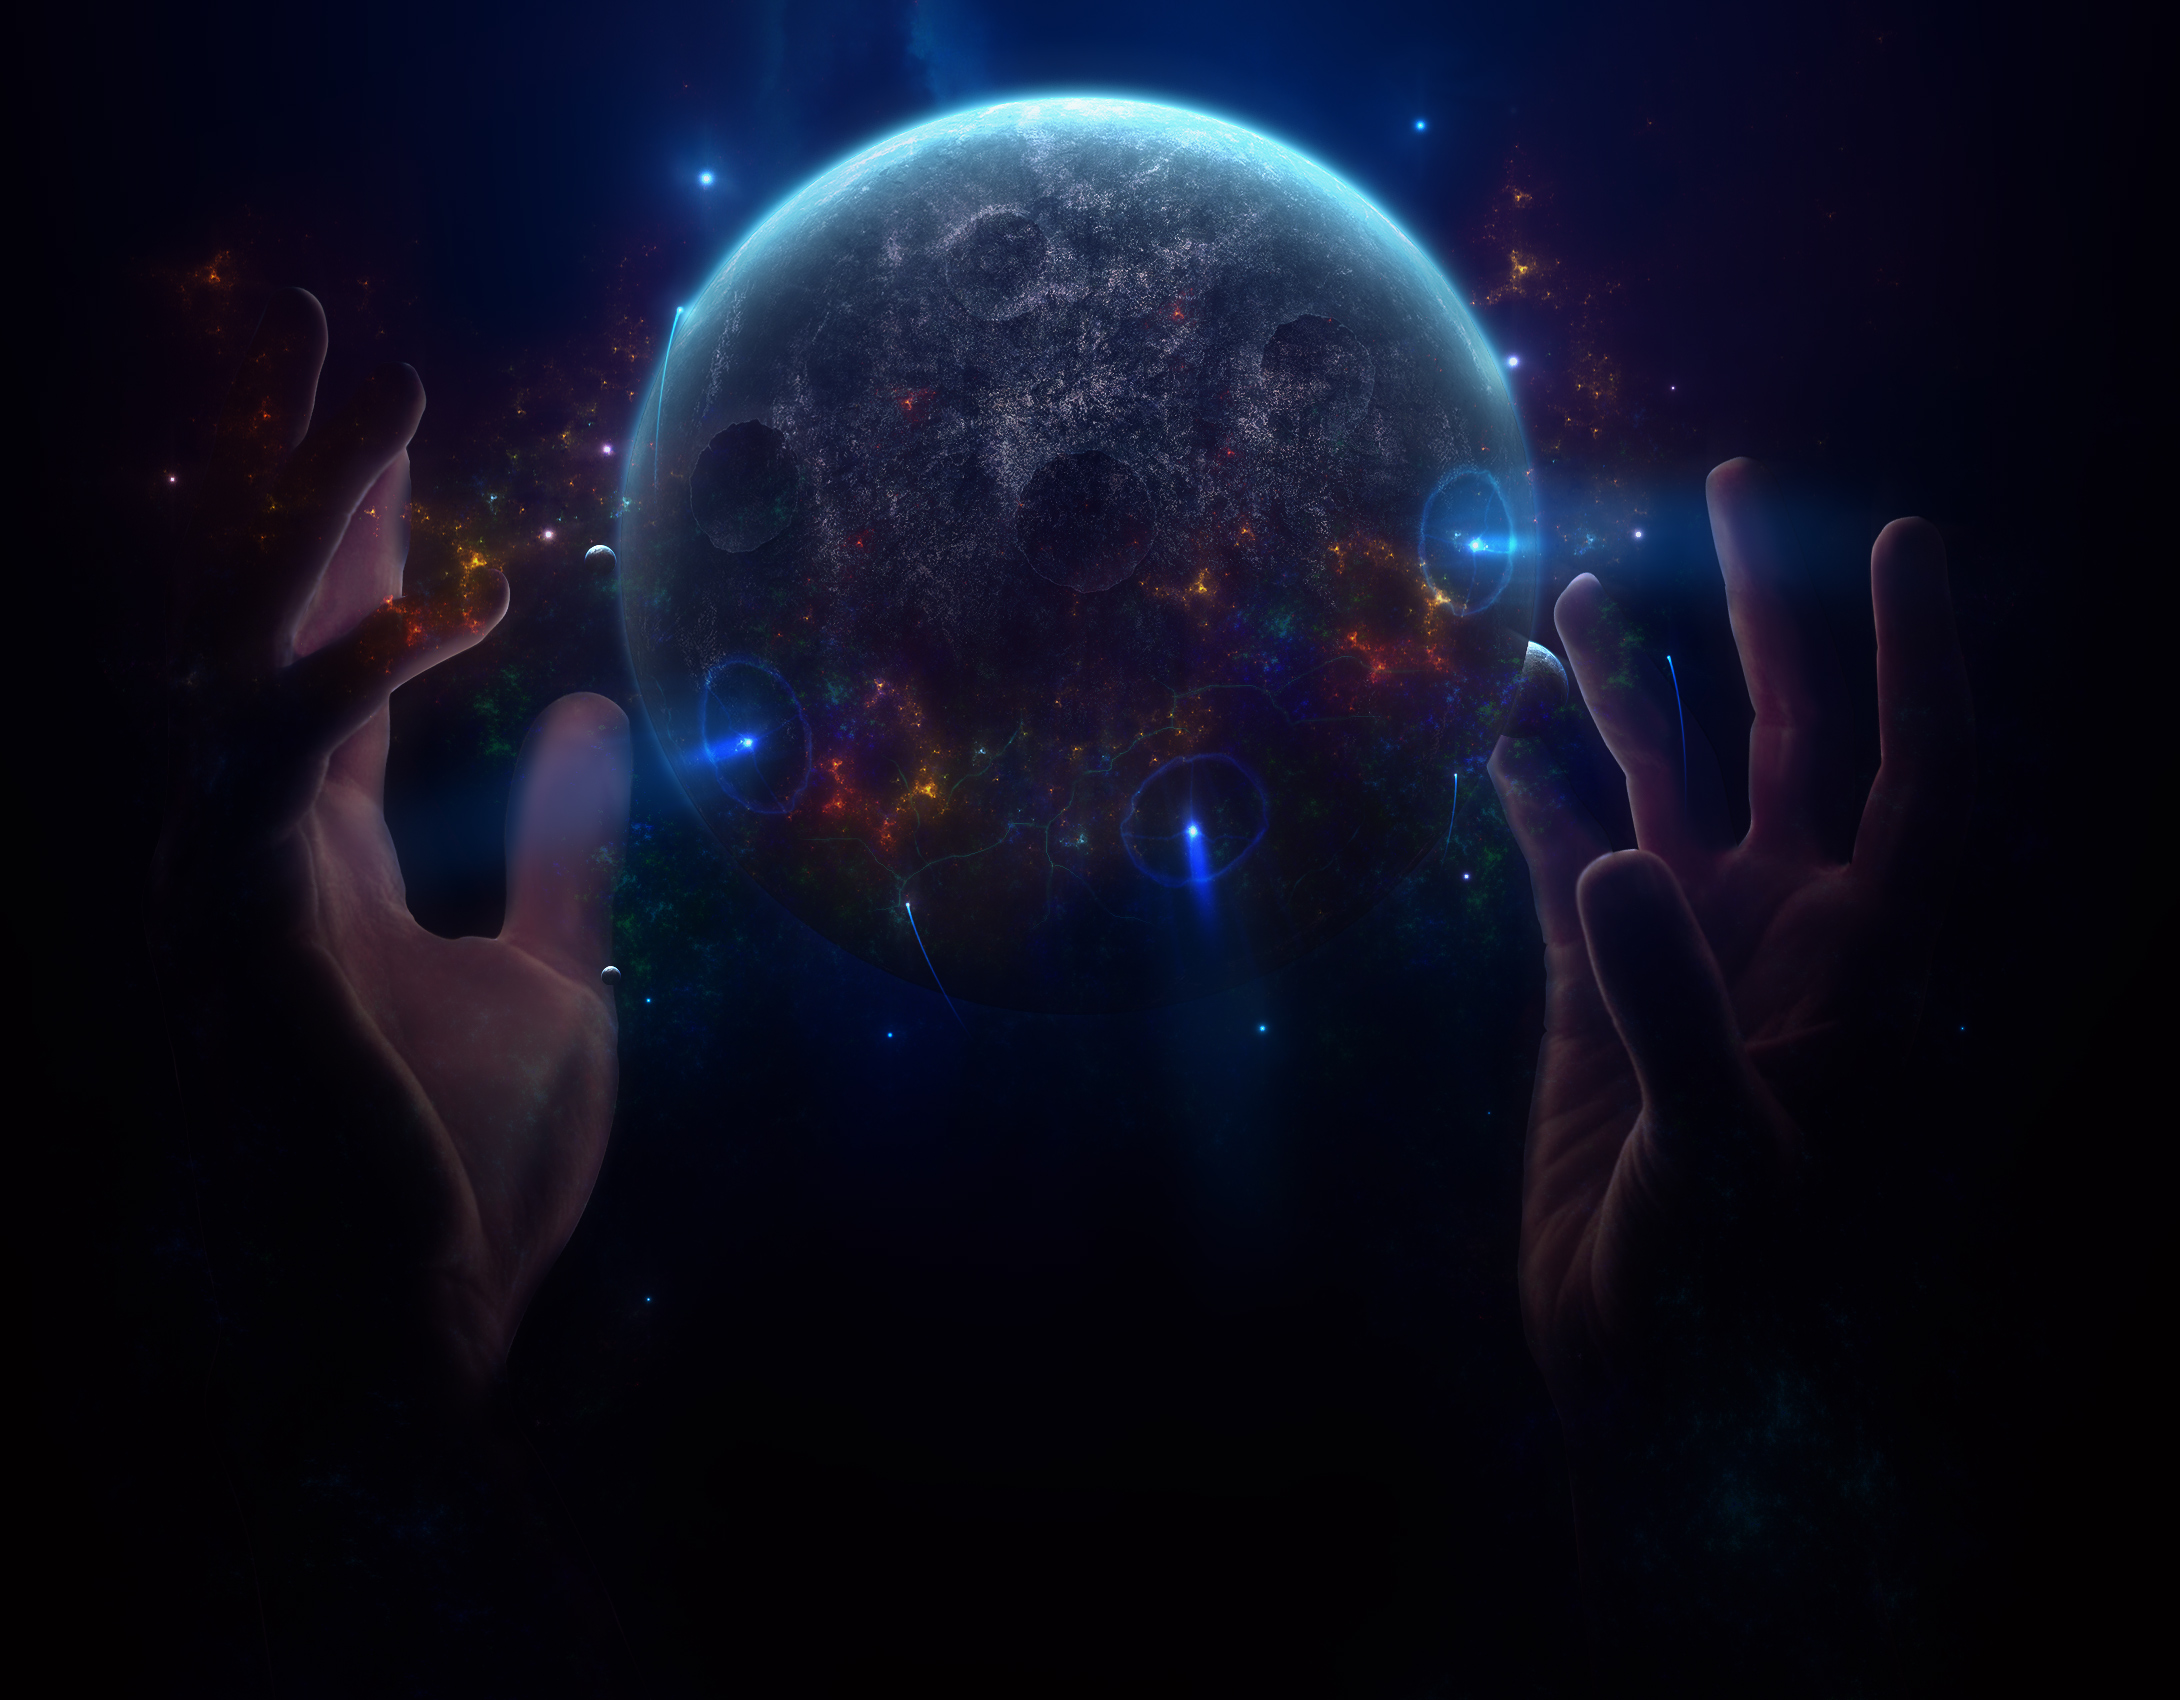 magic_works_by_abikk-d20f7i8.jpg